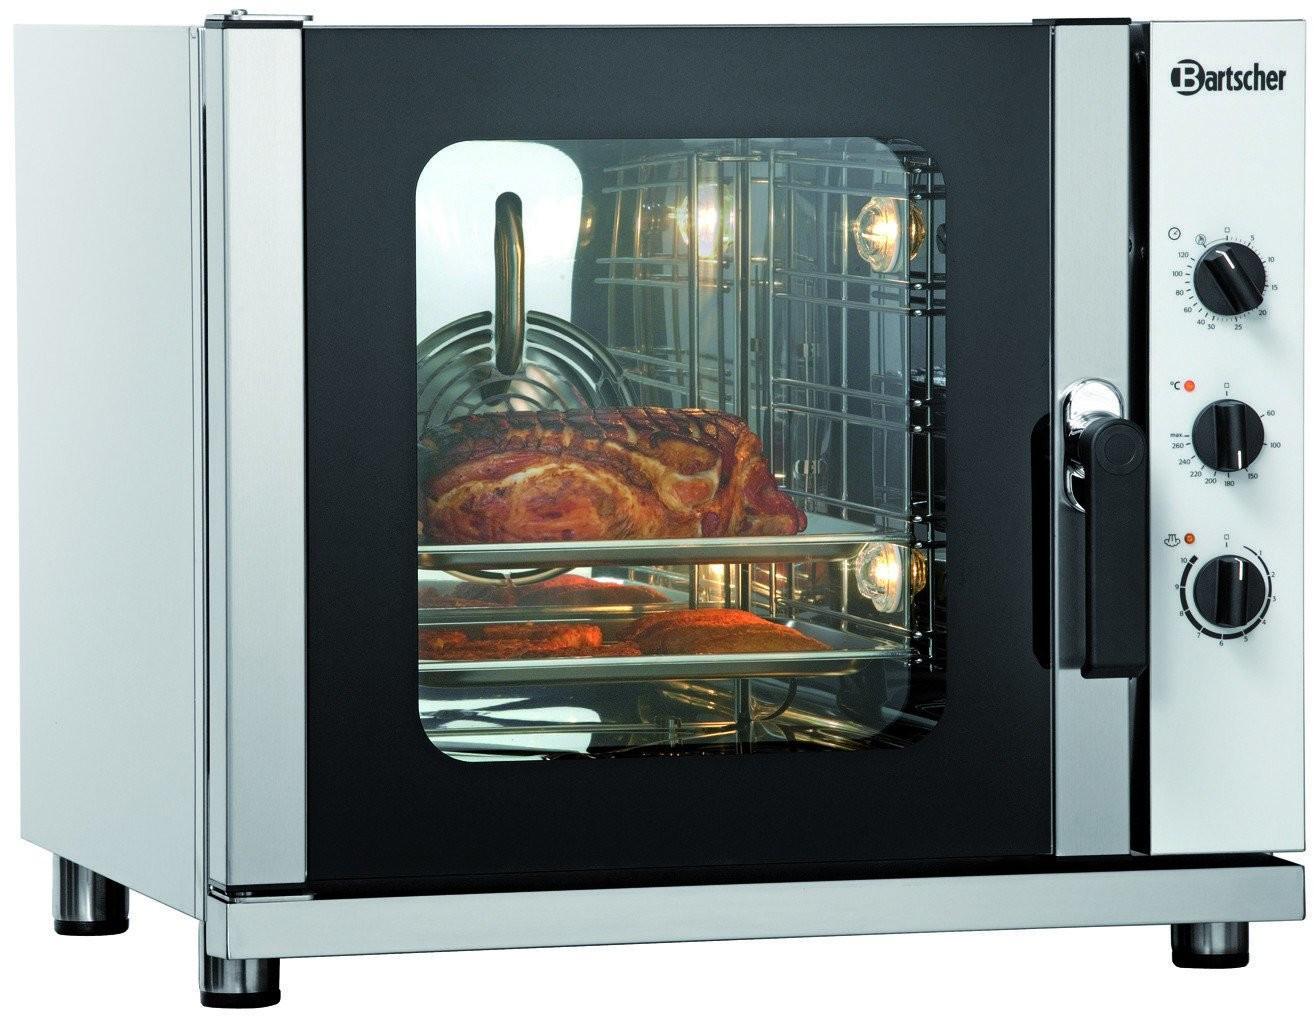 Severin Barbecue Xxl Elektrogrill : Rabatt preisvergleich haus garten u e grills u e elektrogrills